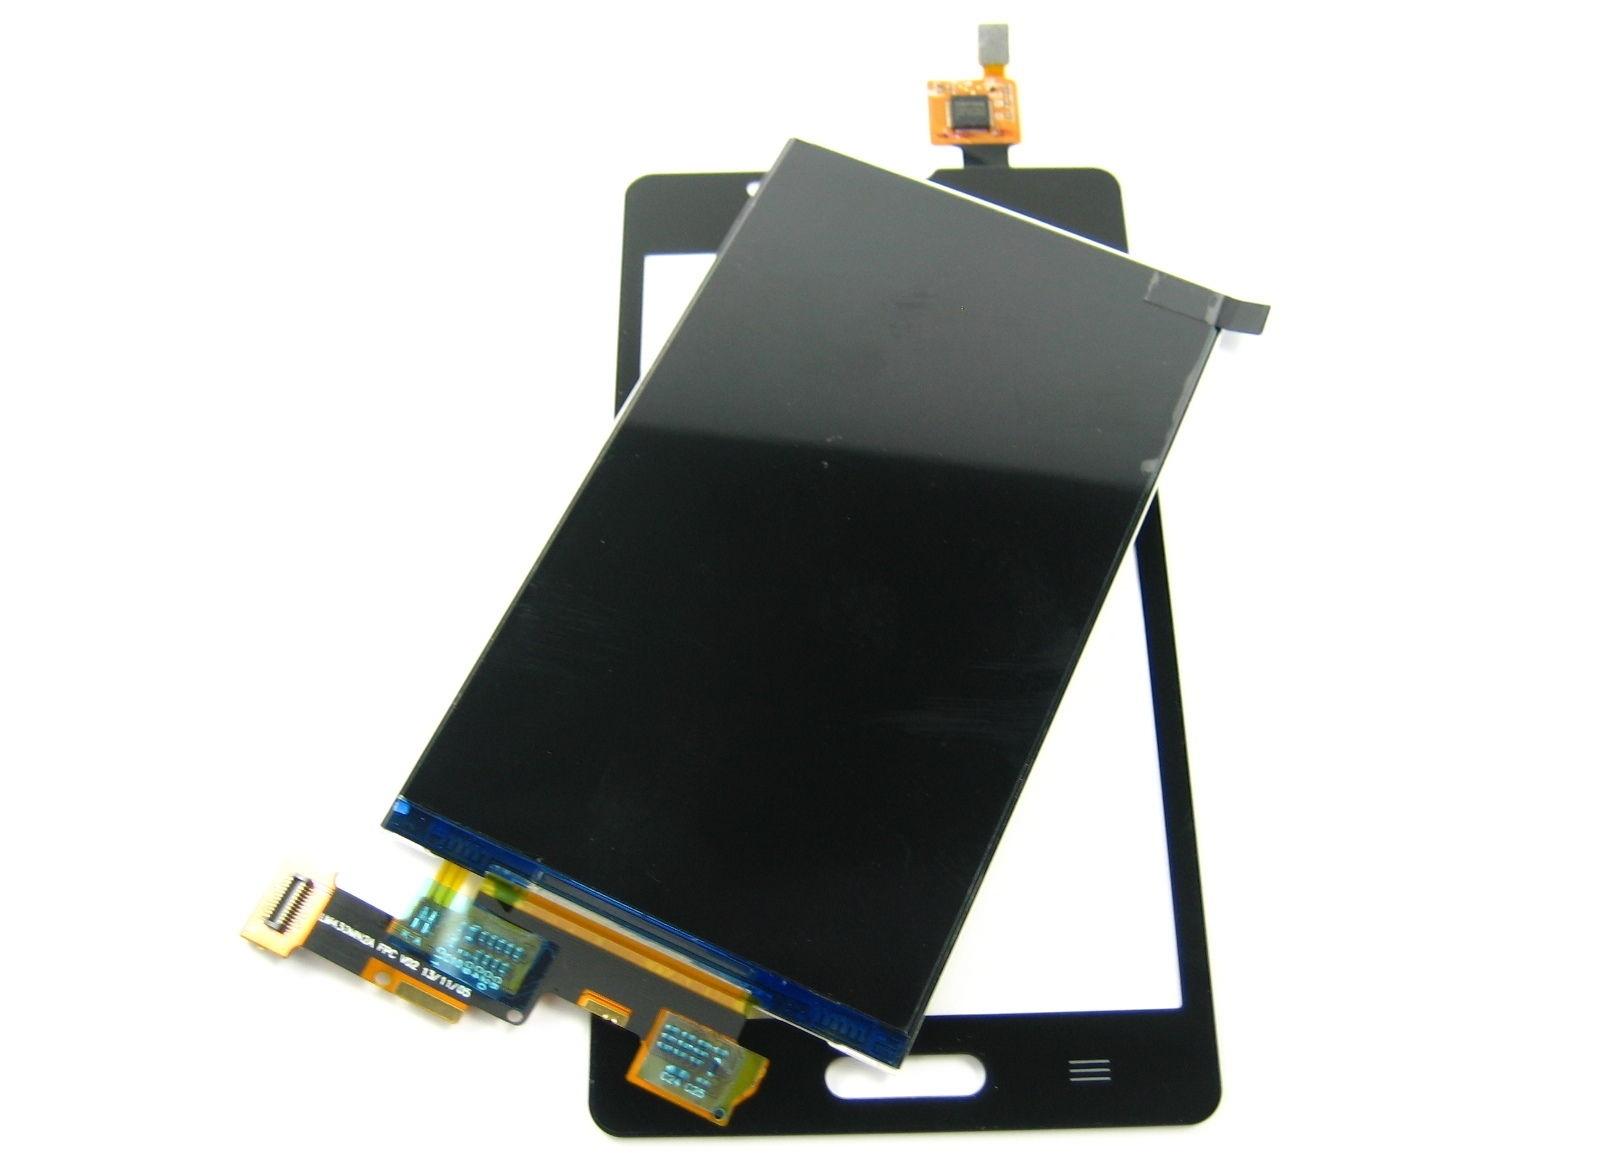 Merawat LCD Handphone.